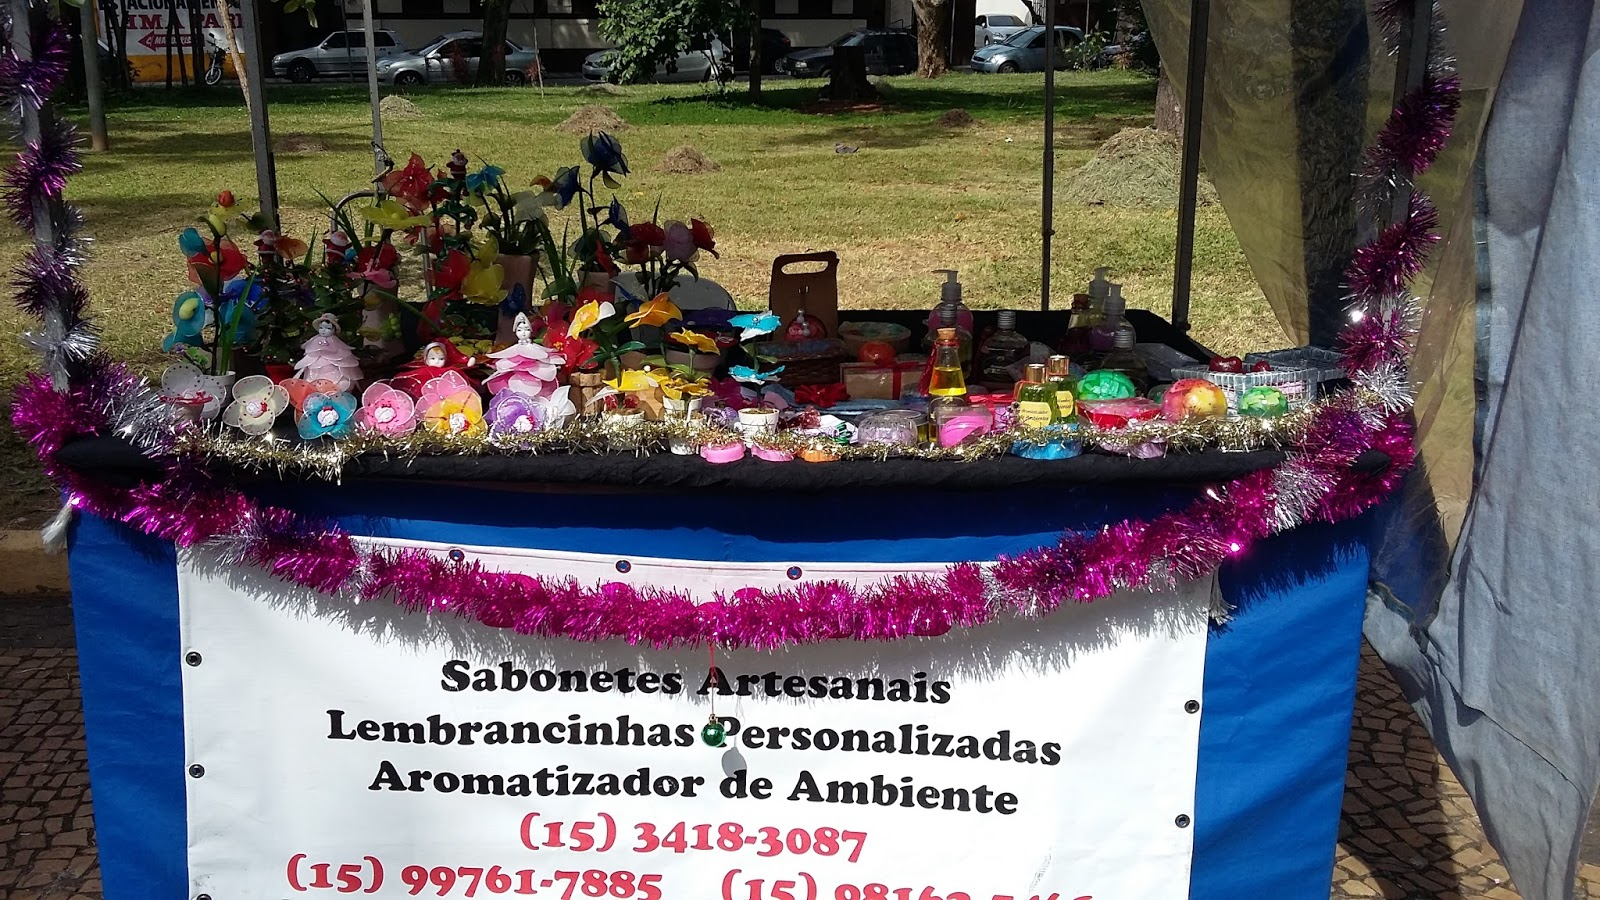 Armario Ropero Sinonimos ~ feira de artesanato em Sorocaba SABONETES HIDRATA